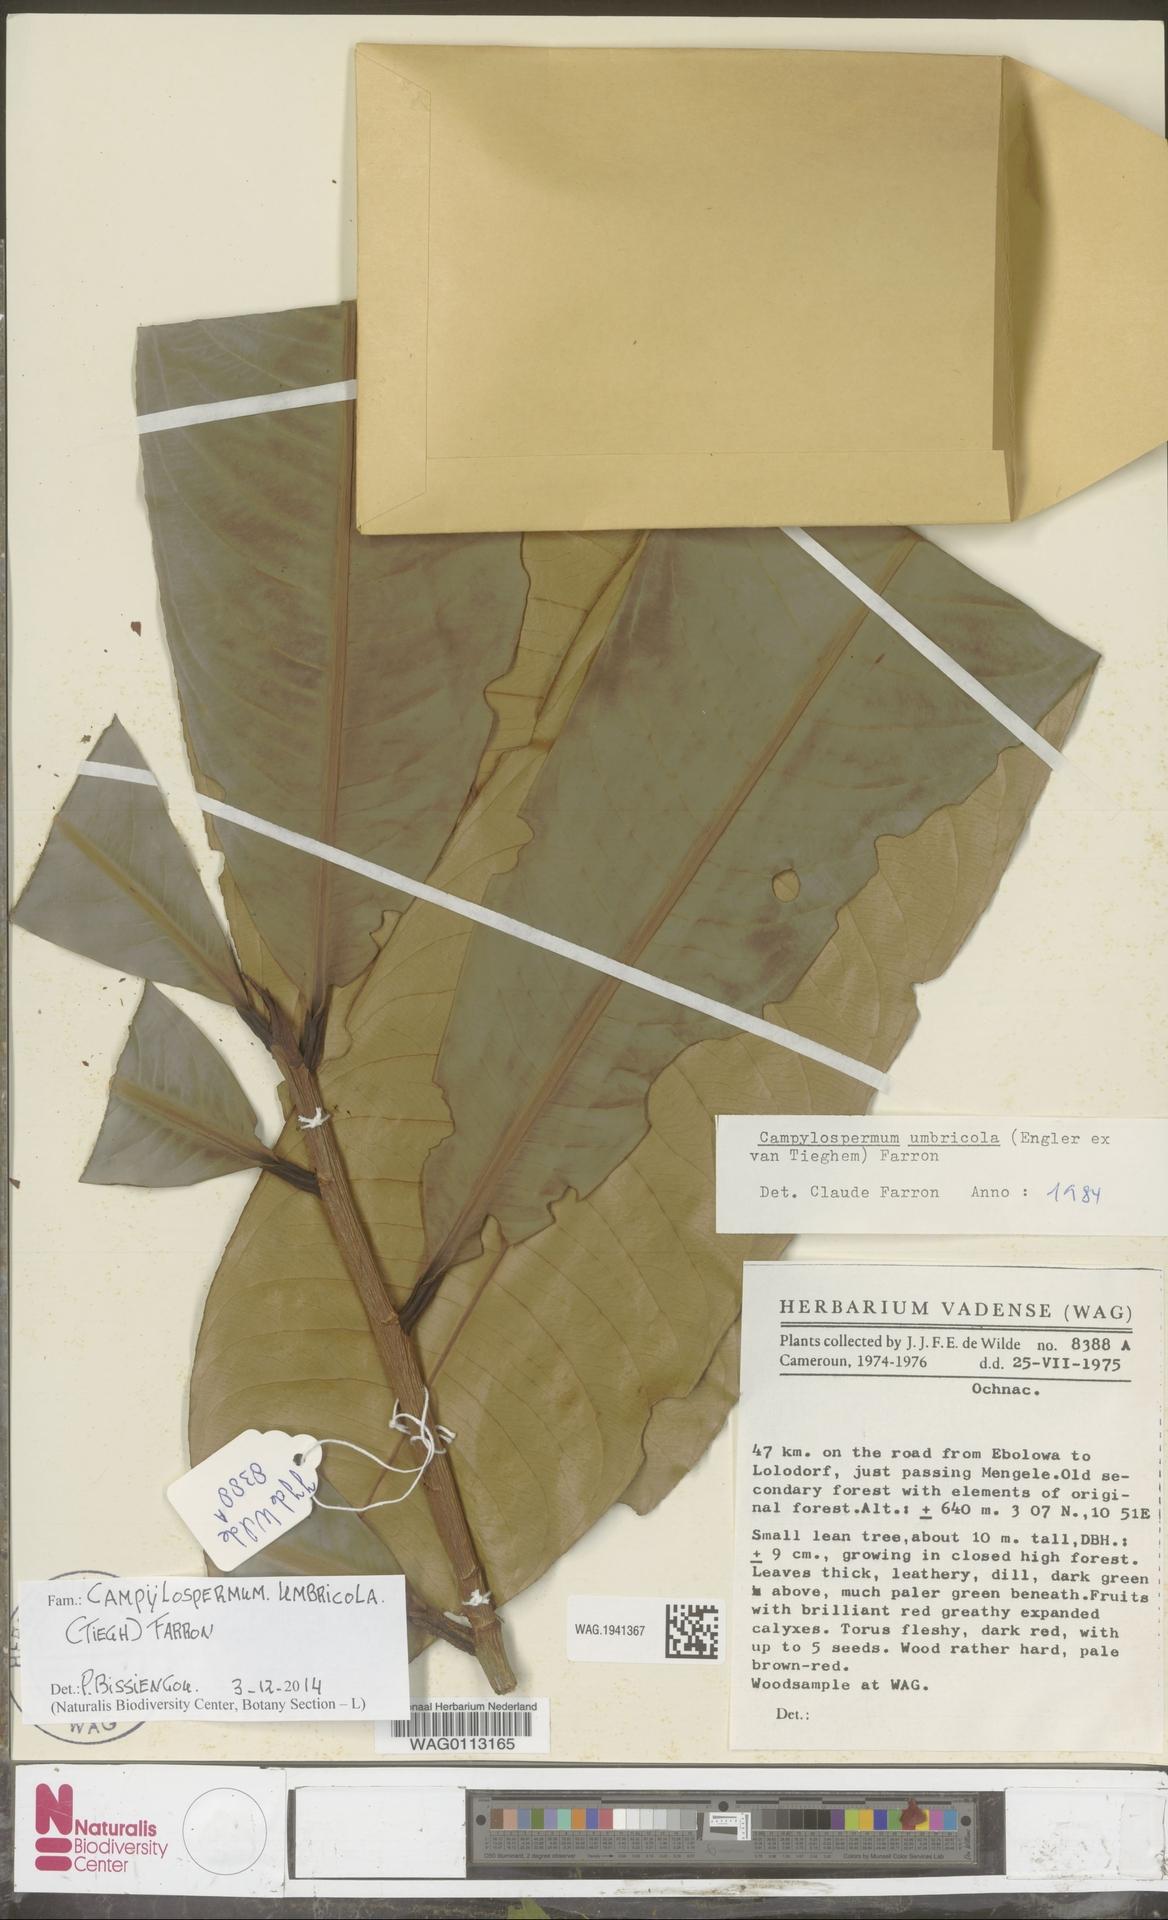 WAG.1941367 | Campylospermum umbricola (Tiegh.) Farron